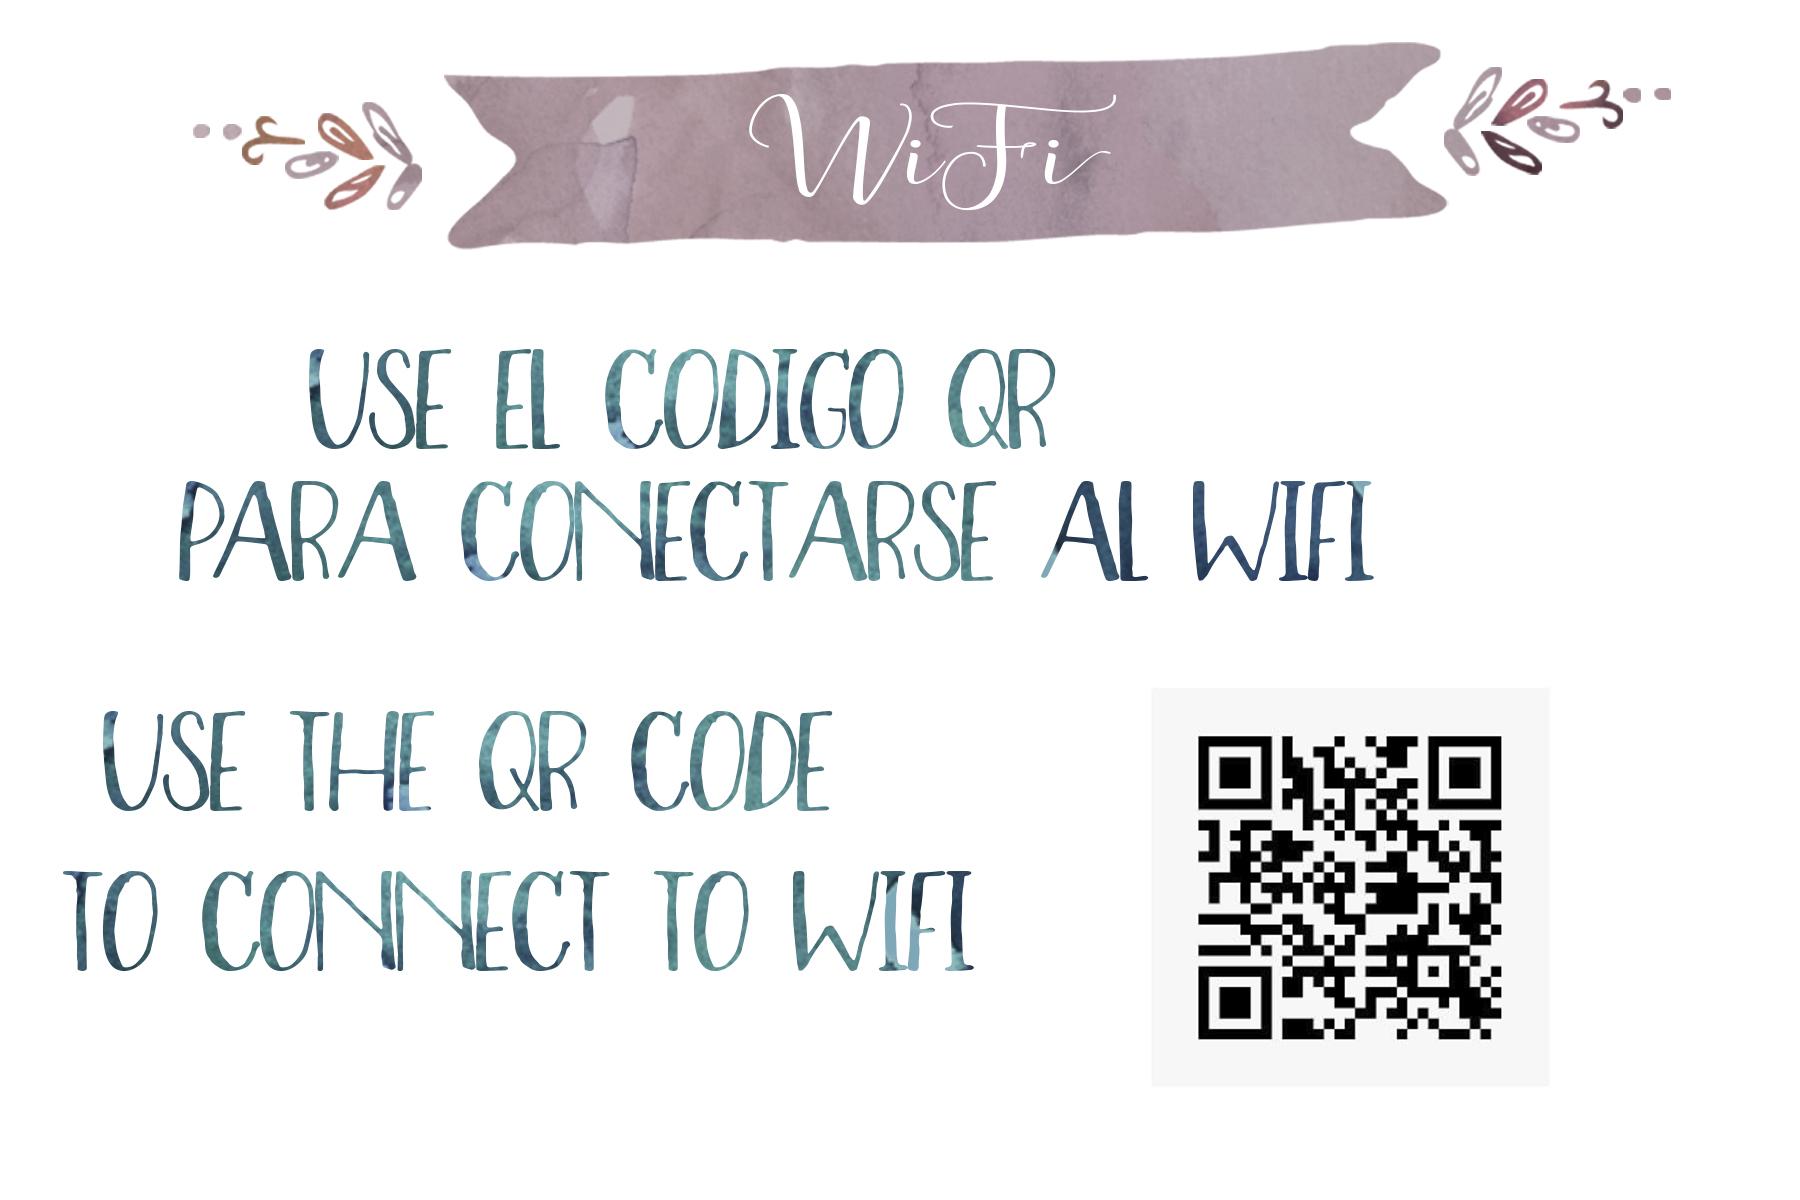 WiFi QR Code